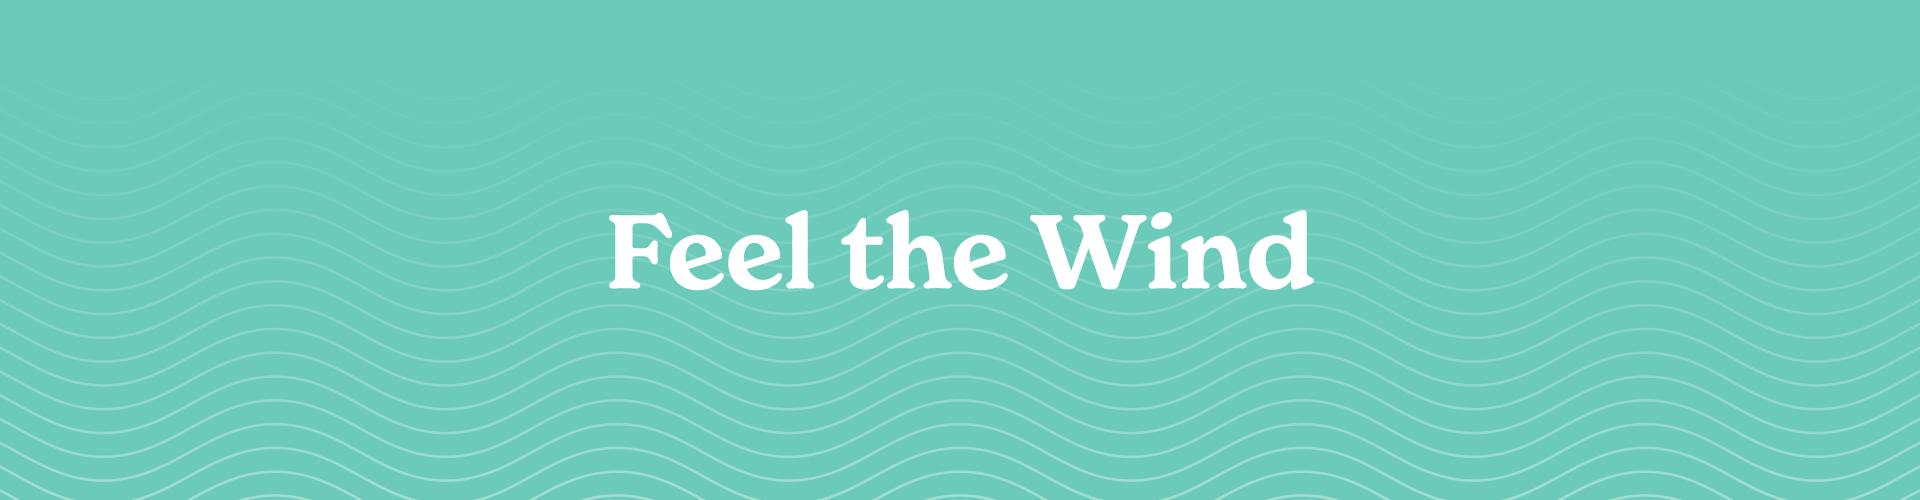 headwind-yoga-feel-the-wind